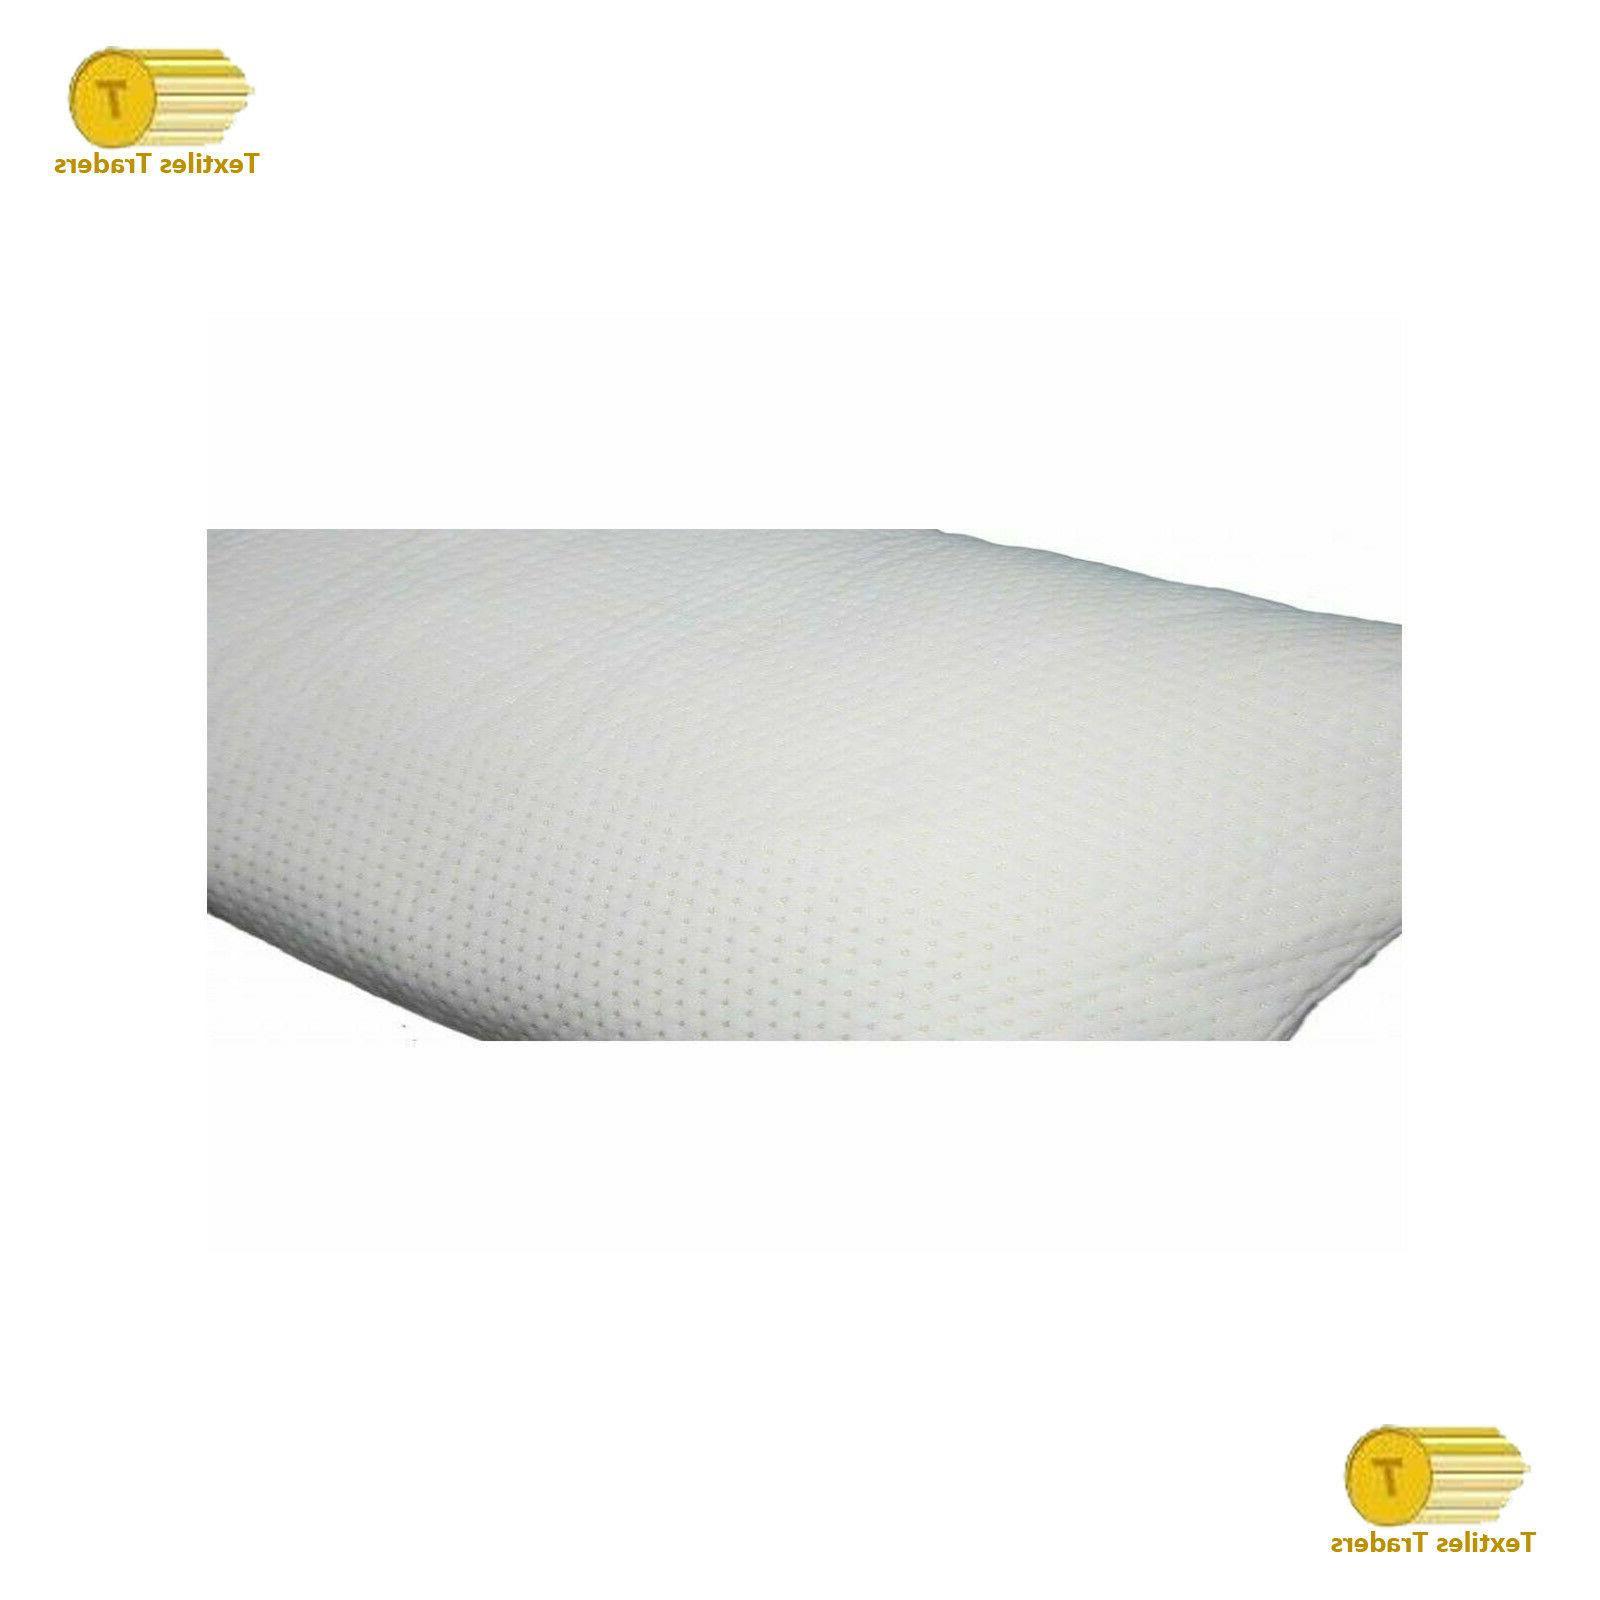 2 x Shredded Memory Pillow Firm Head Neck Pillow